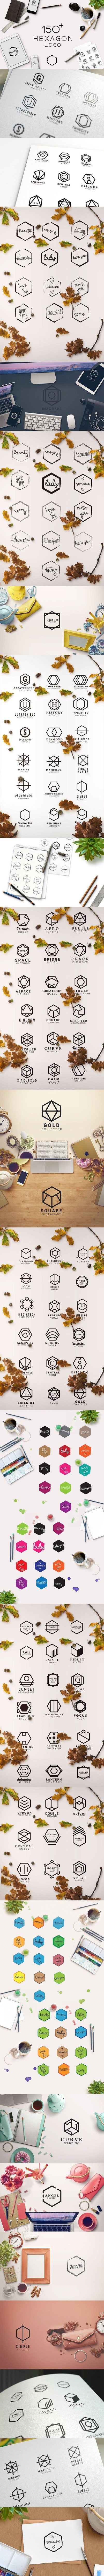 150+ Minimal Hexagon Logo Templates. Wedding Card Templates